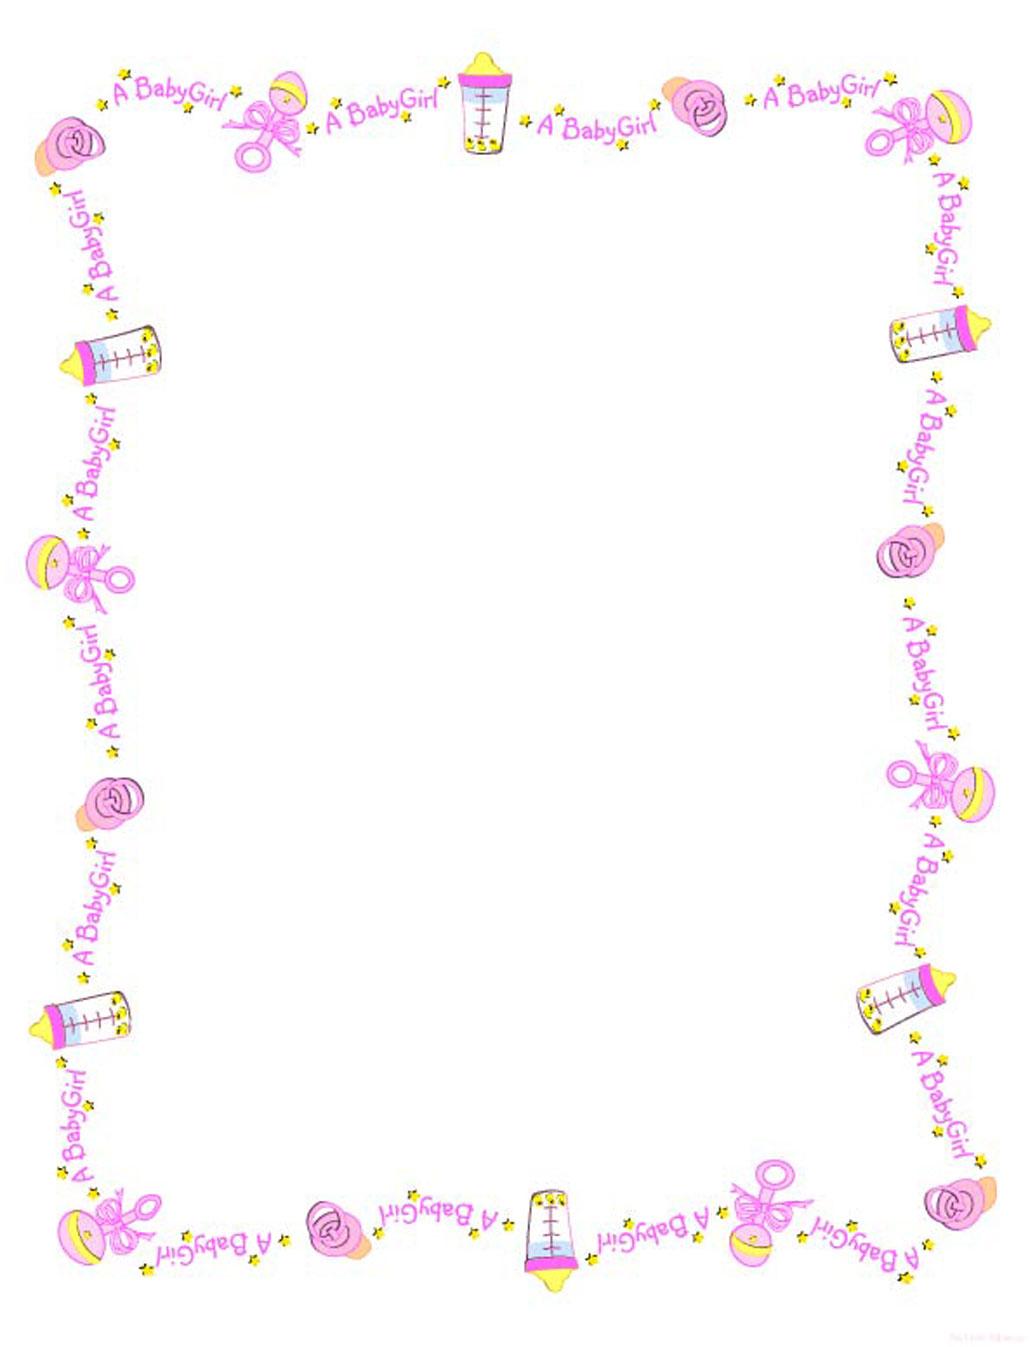 Printable Baby Girl Borders Download JPEGBaby Girl Borders